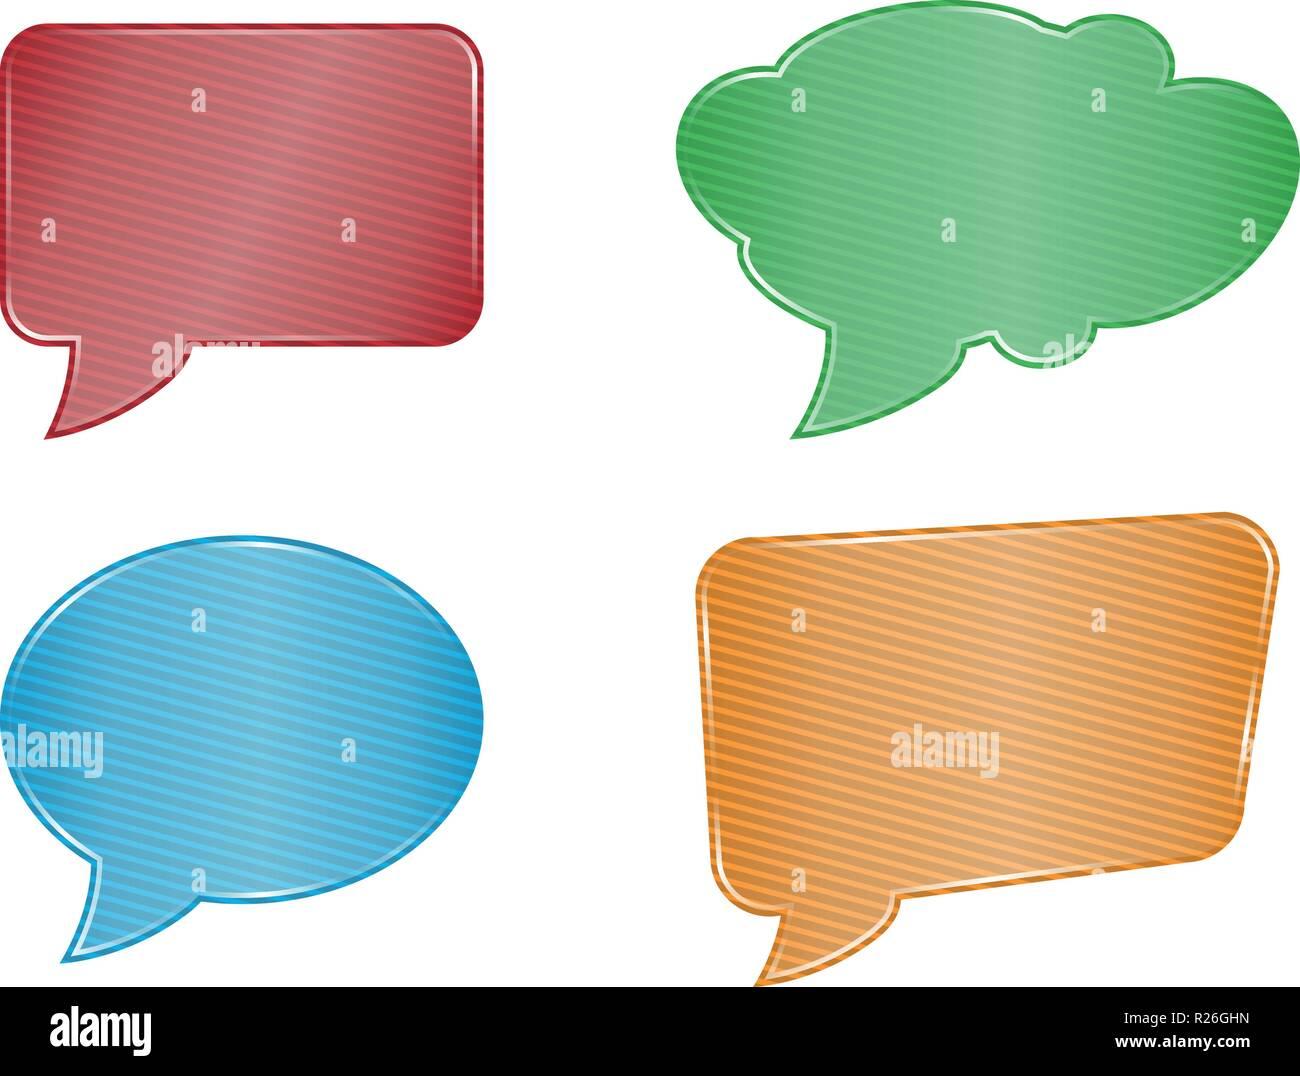 colorfull speech bubble set on white background - Stock Image